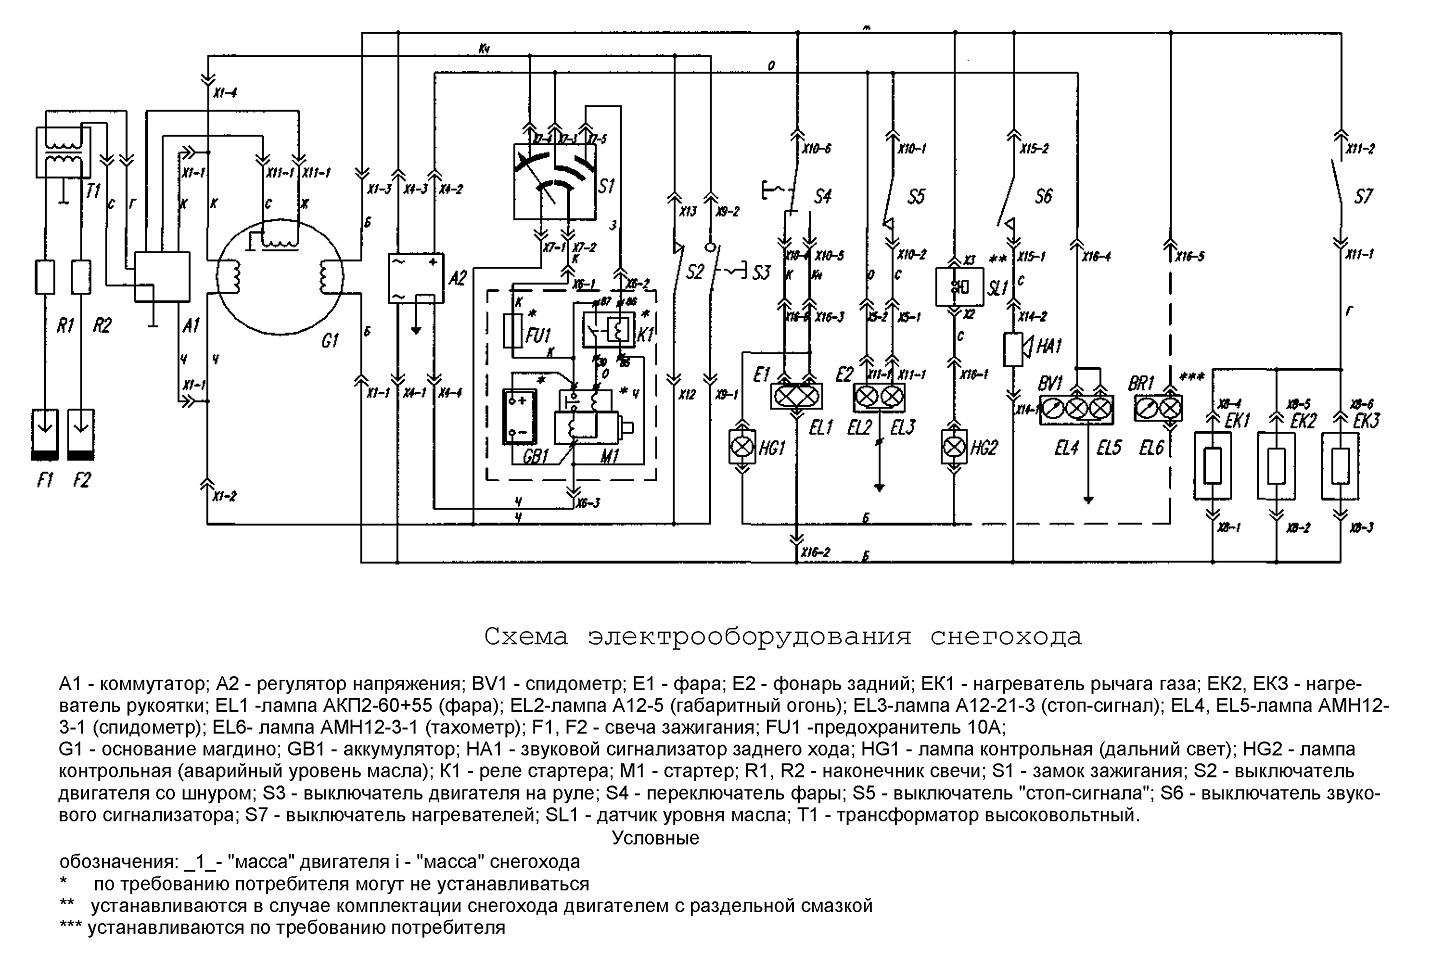 Регулятор напряжения тайга схема фото 115